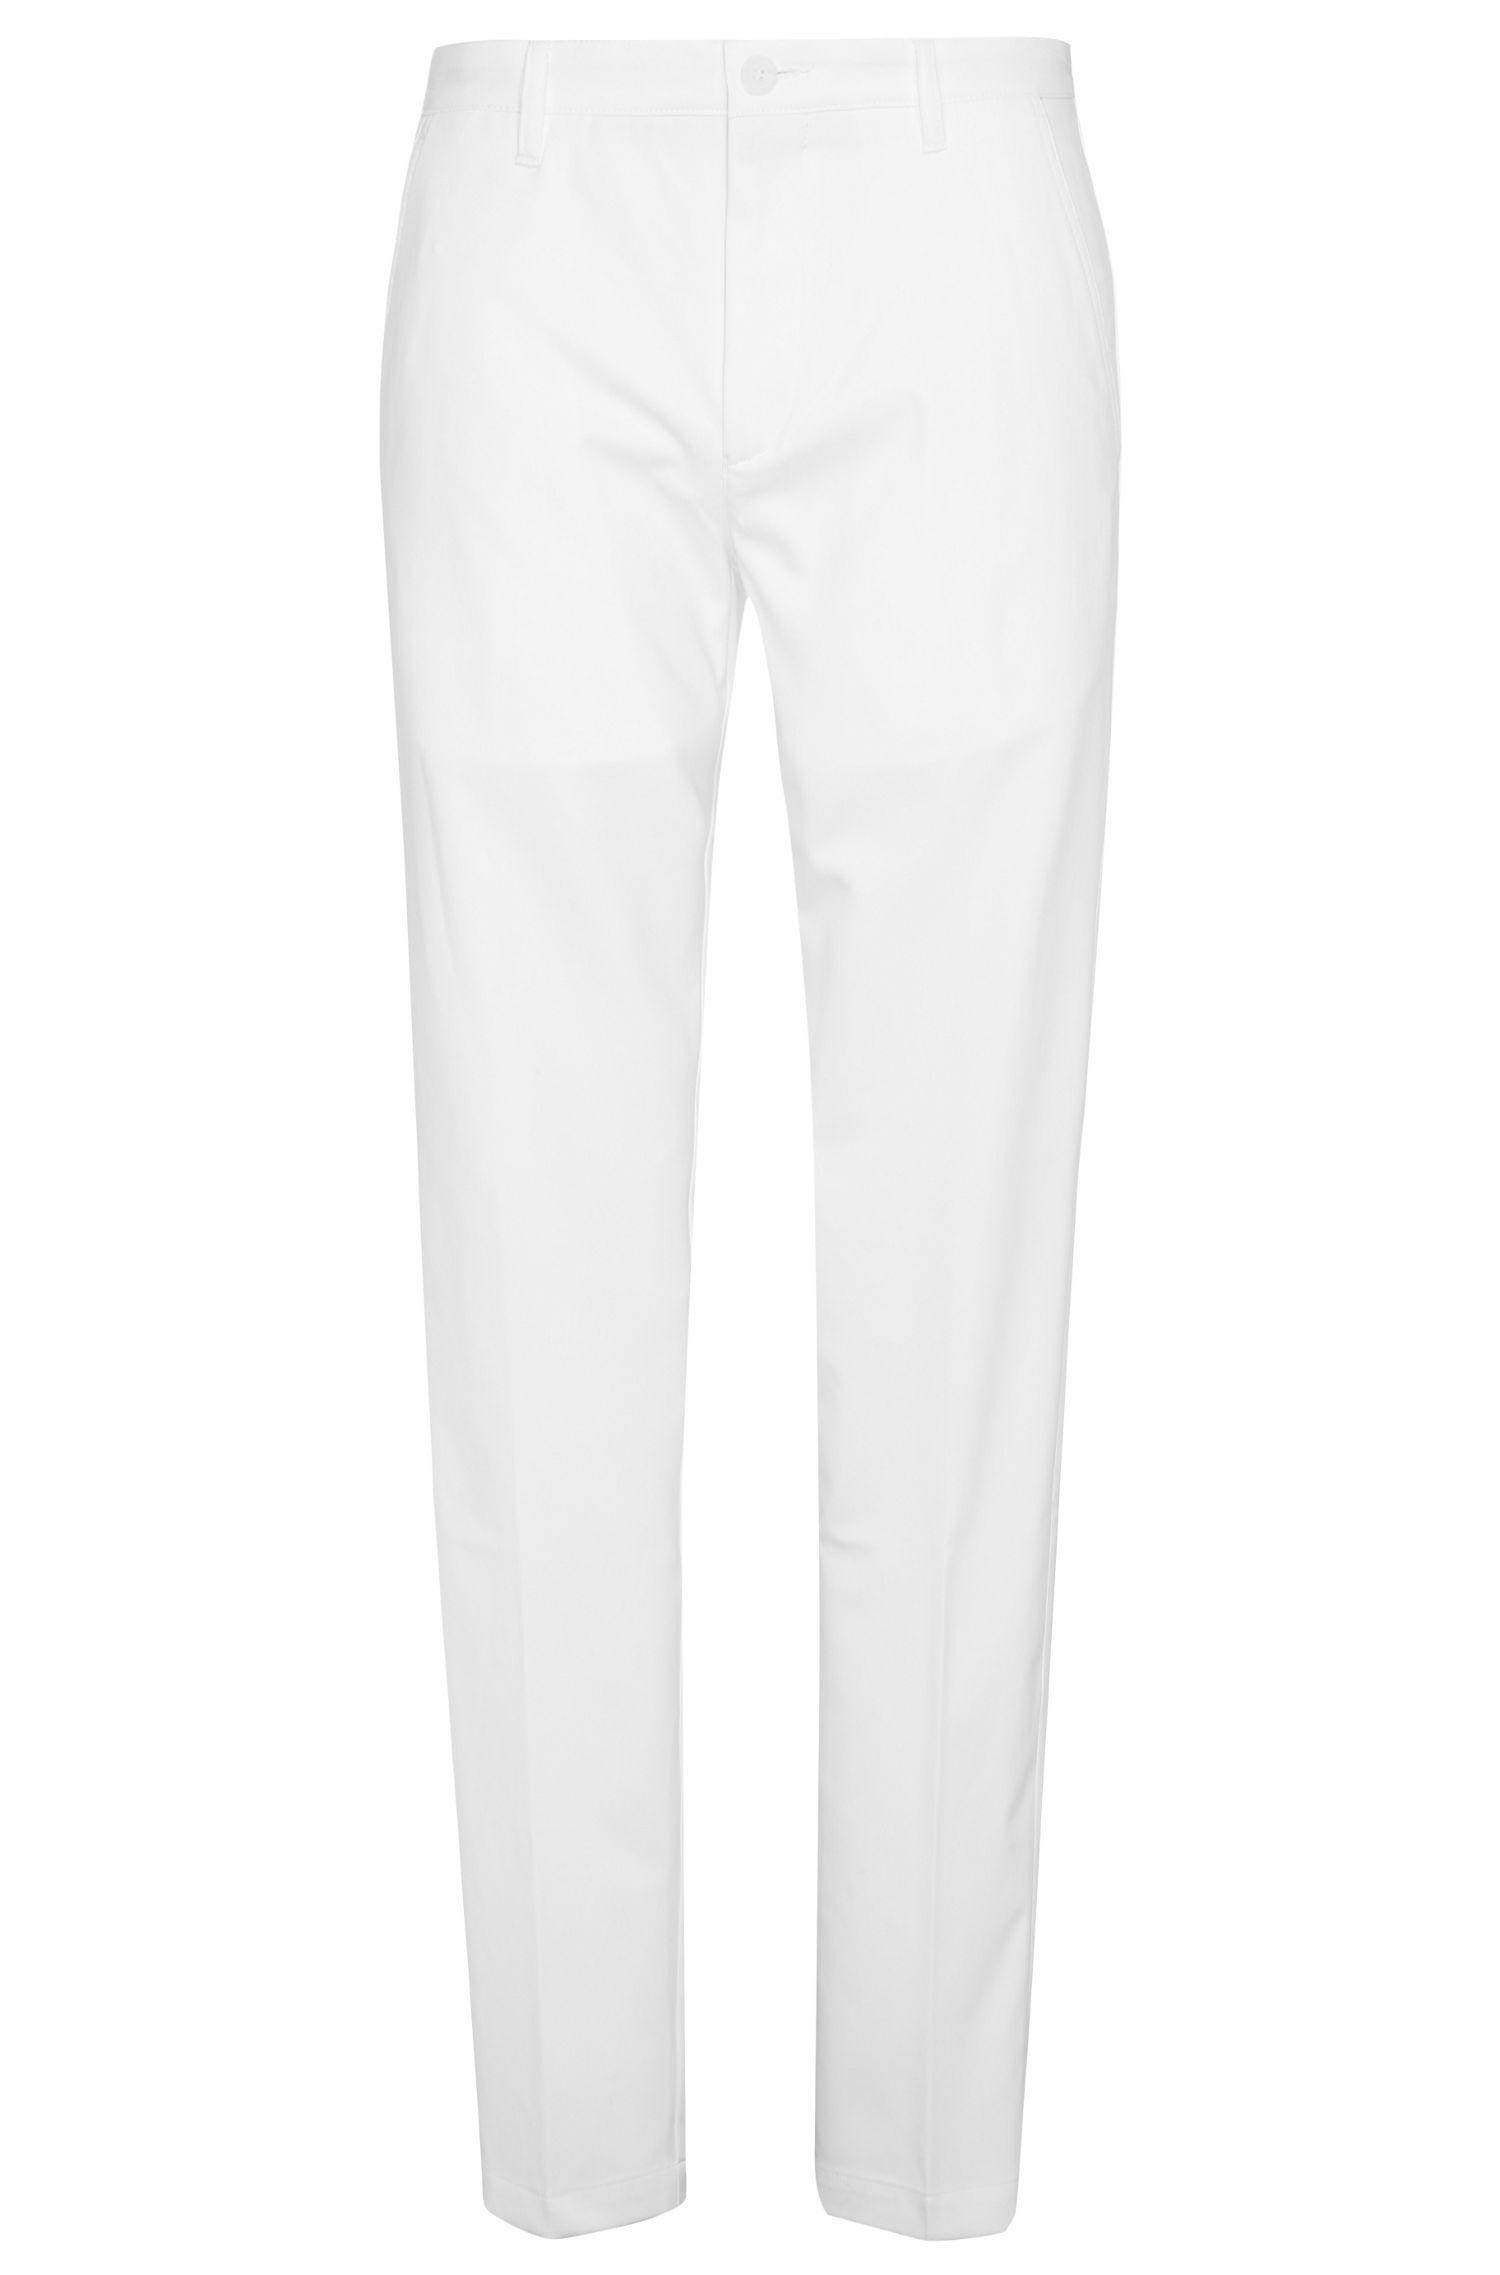 'Hakan'   Slim Fit, CoolMax Performance Golf Pants